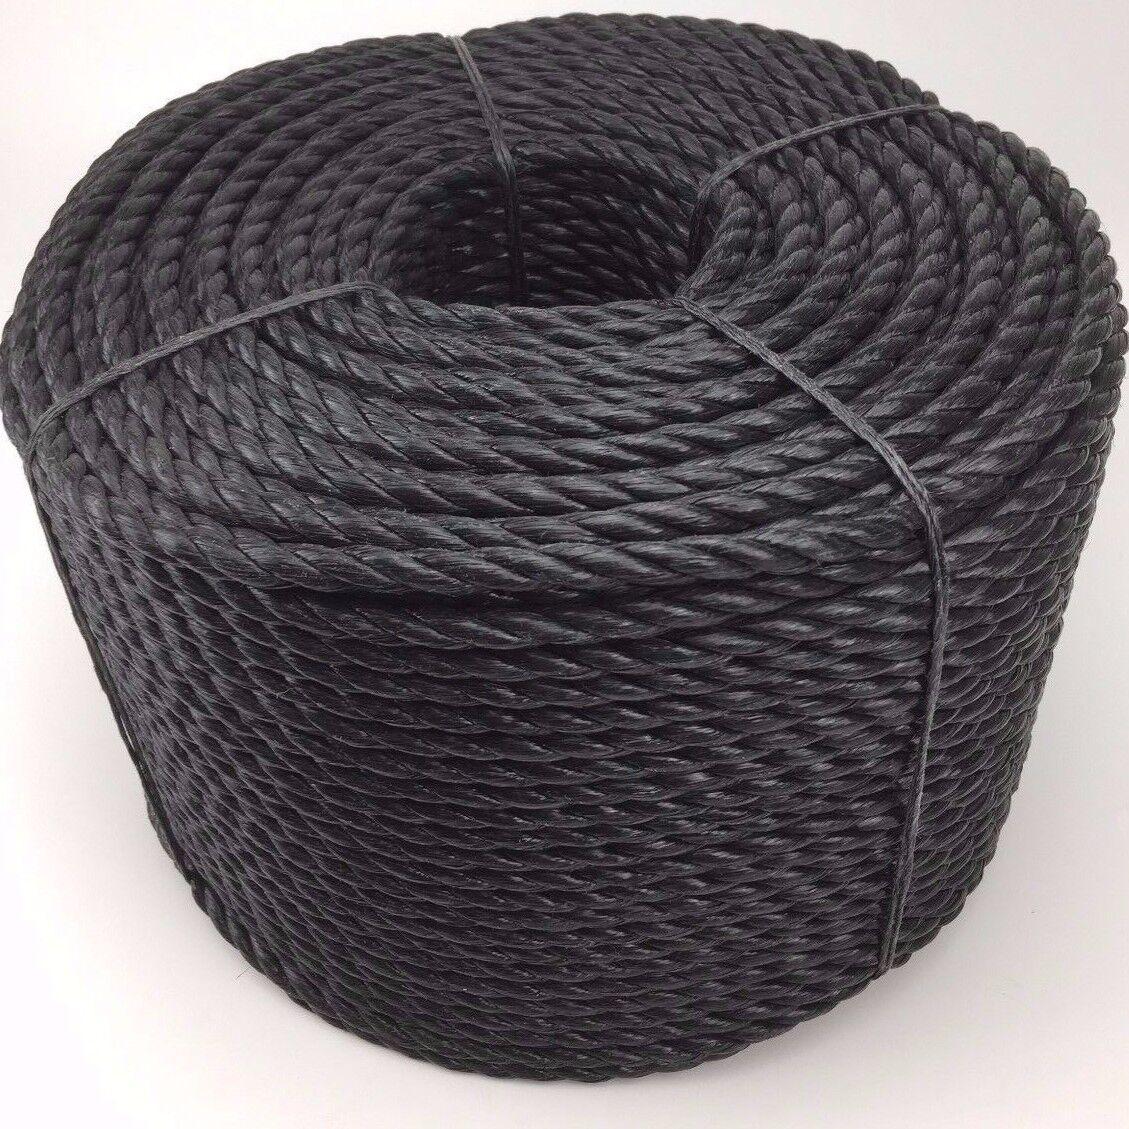 6mm orange Polypropylene Rope x 500m Coil, orange Poly Rope Coils, Polyrope